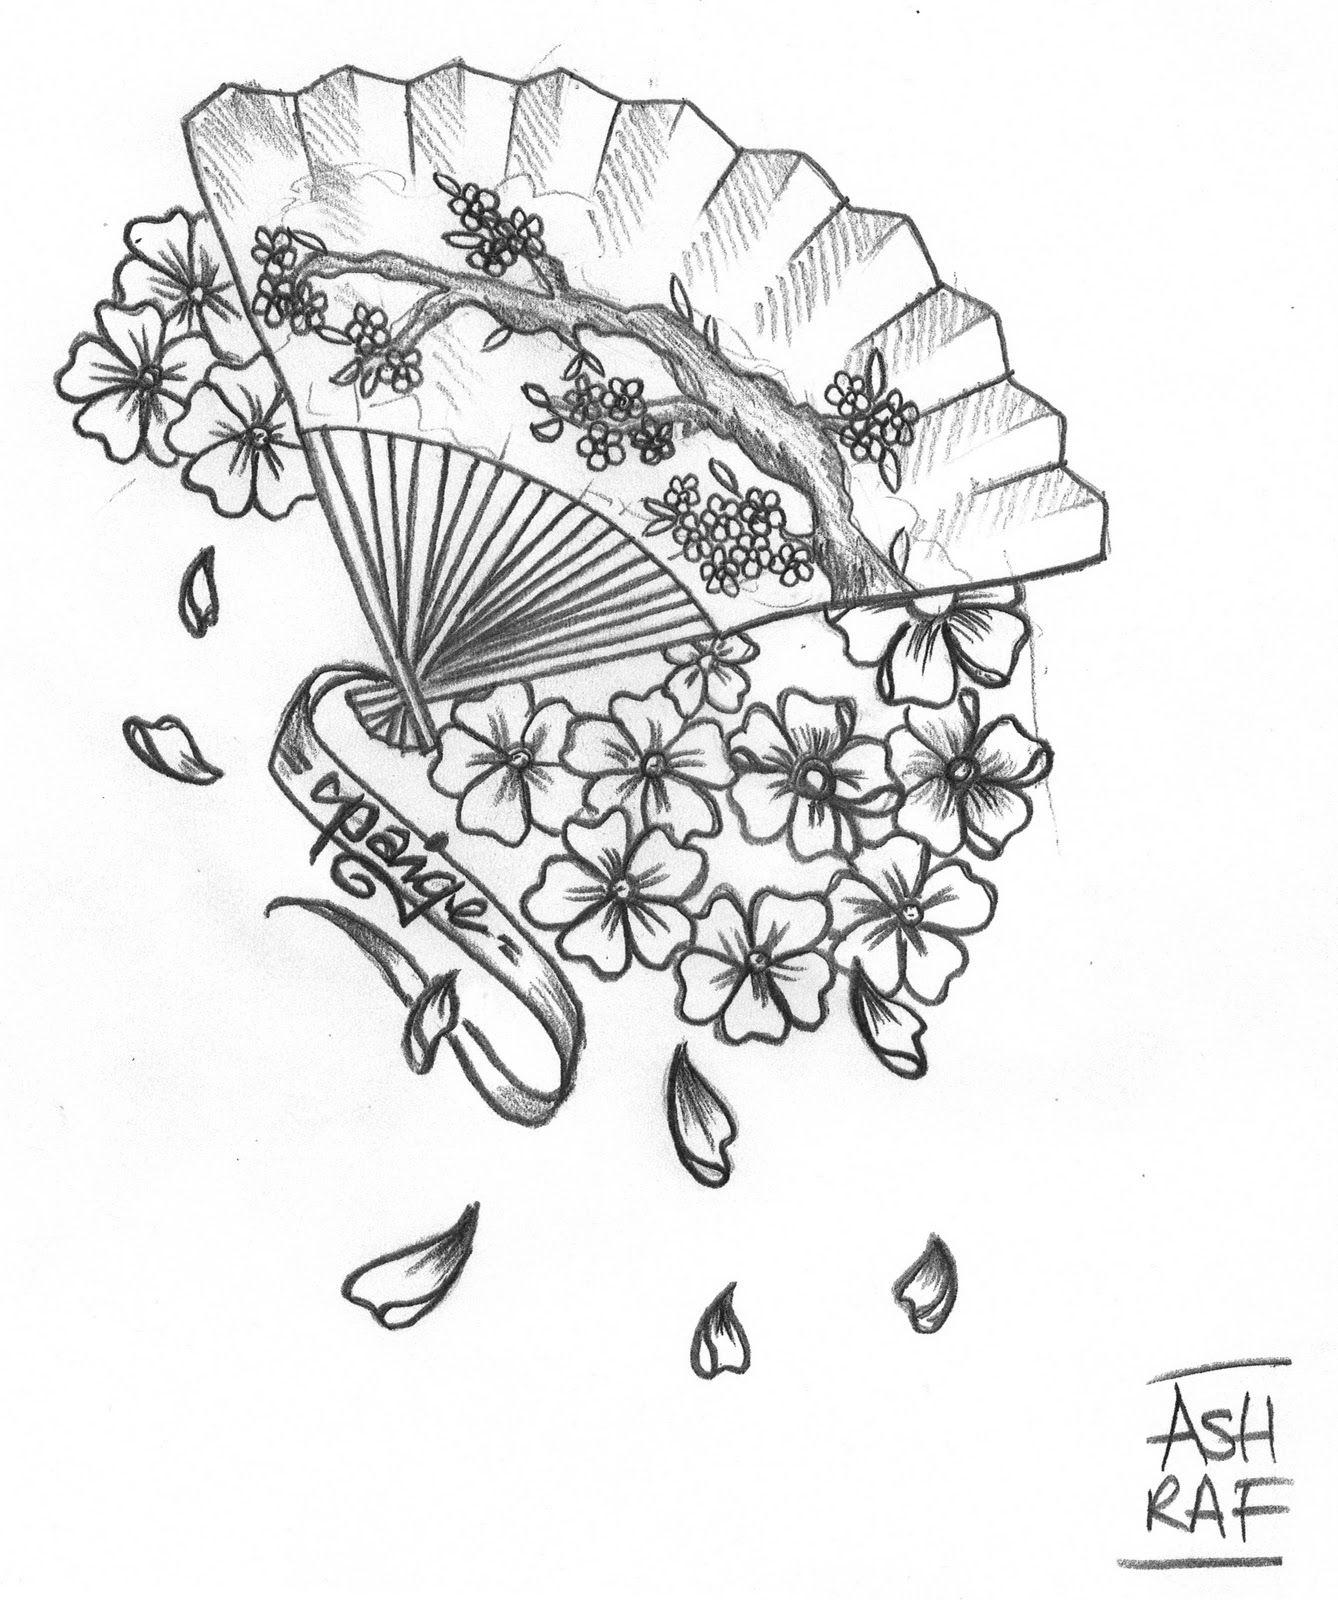 japanese fan tattoo designs sketch coloring page. Black Bedroom Furniture Sets. Home Design Ideas